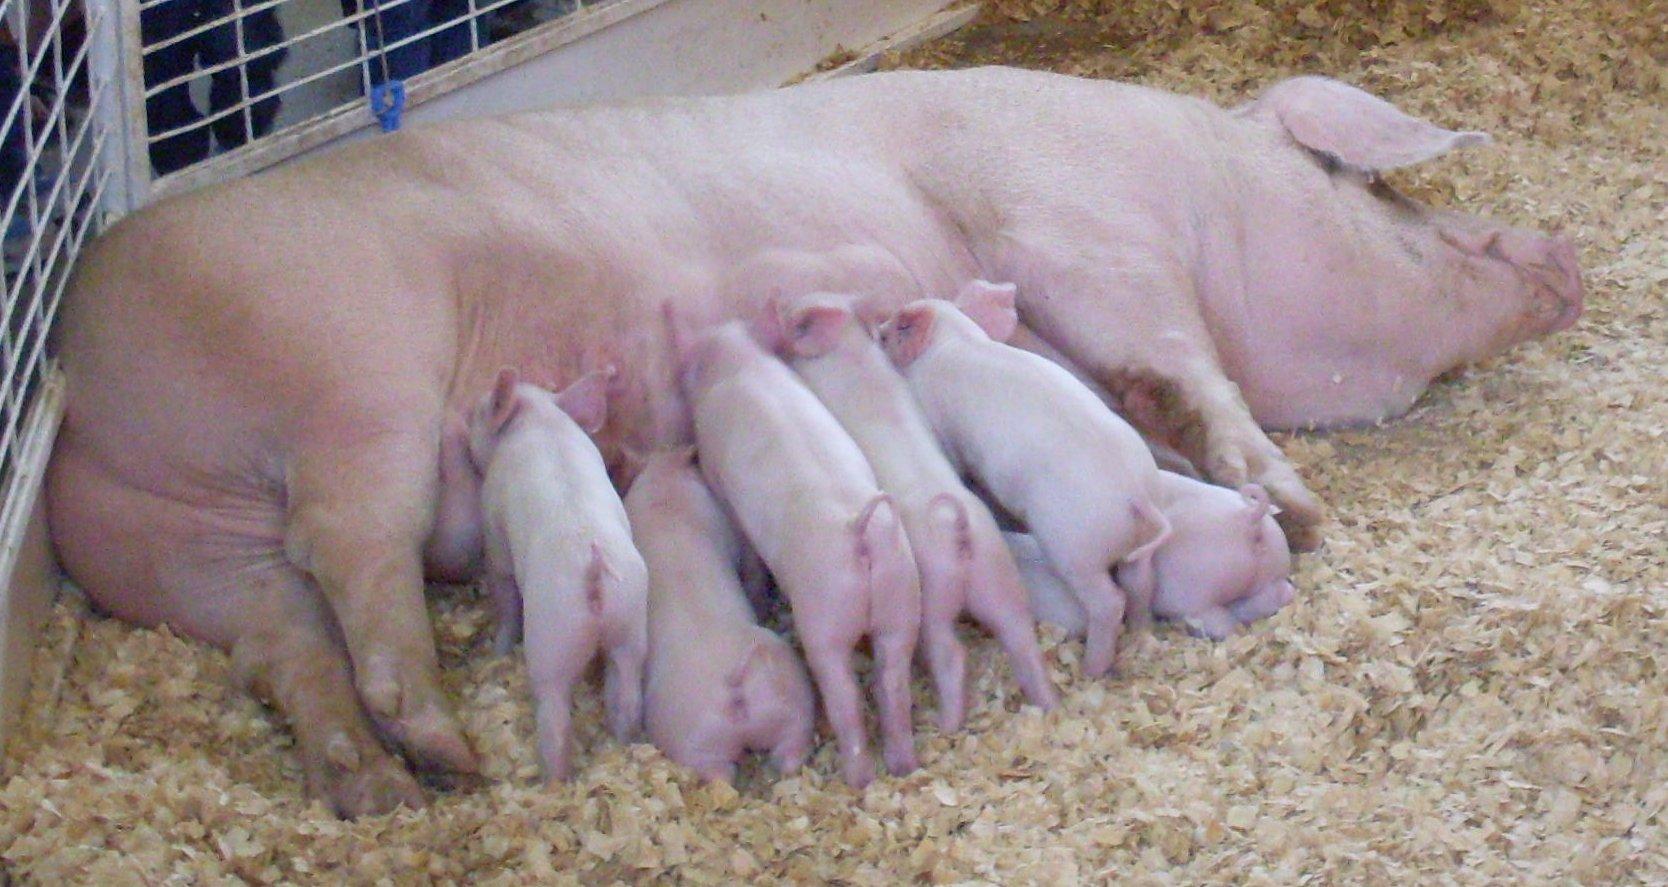 Breeding pigs